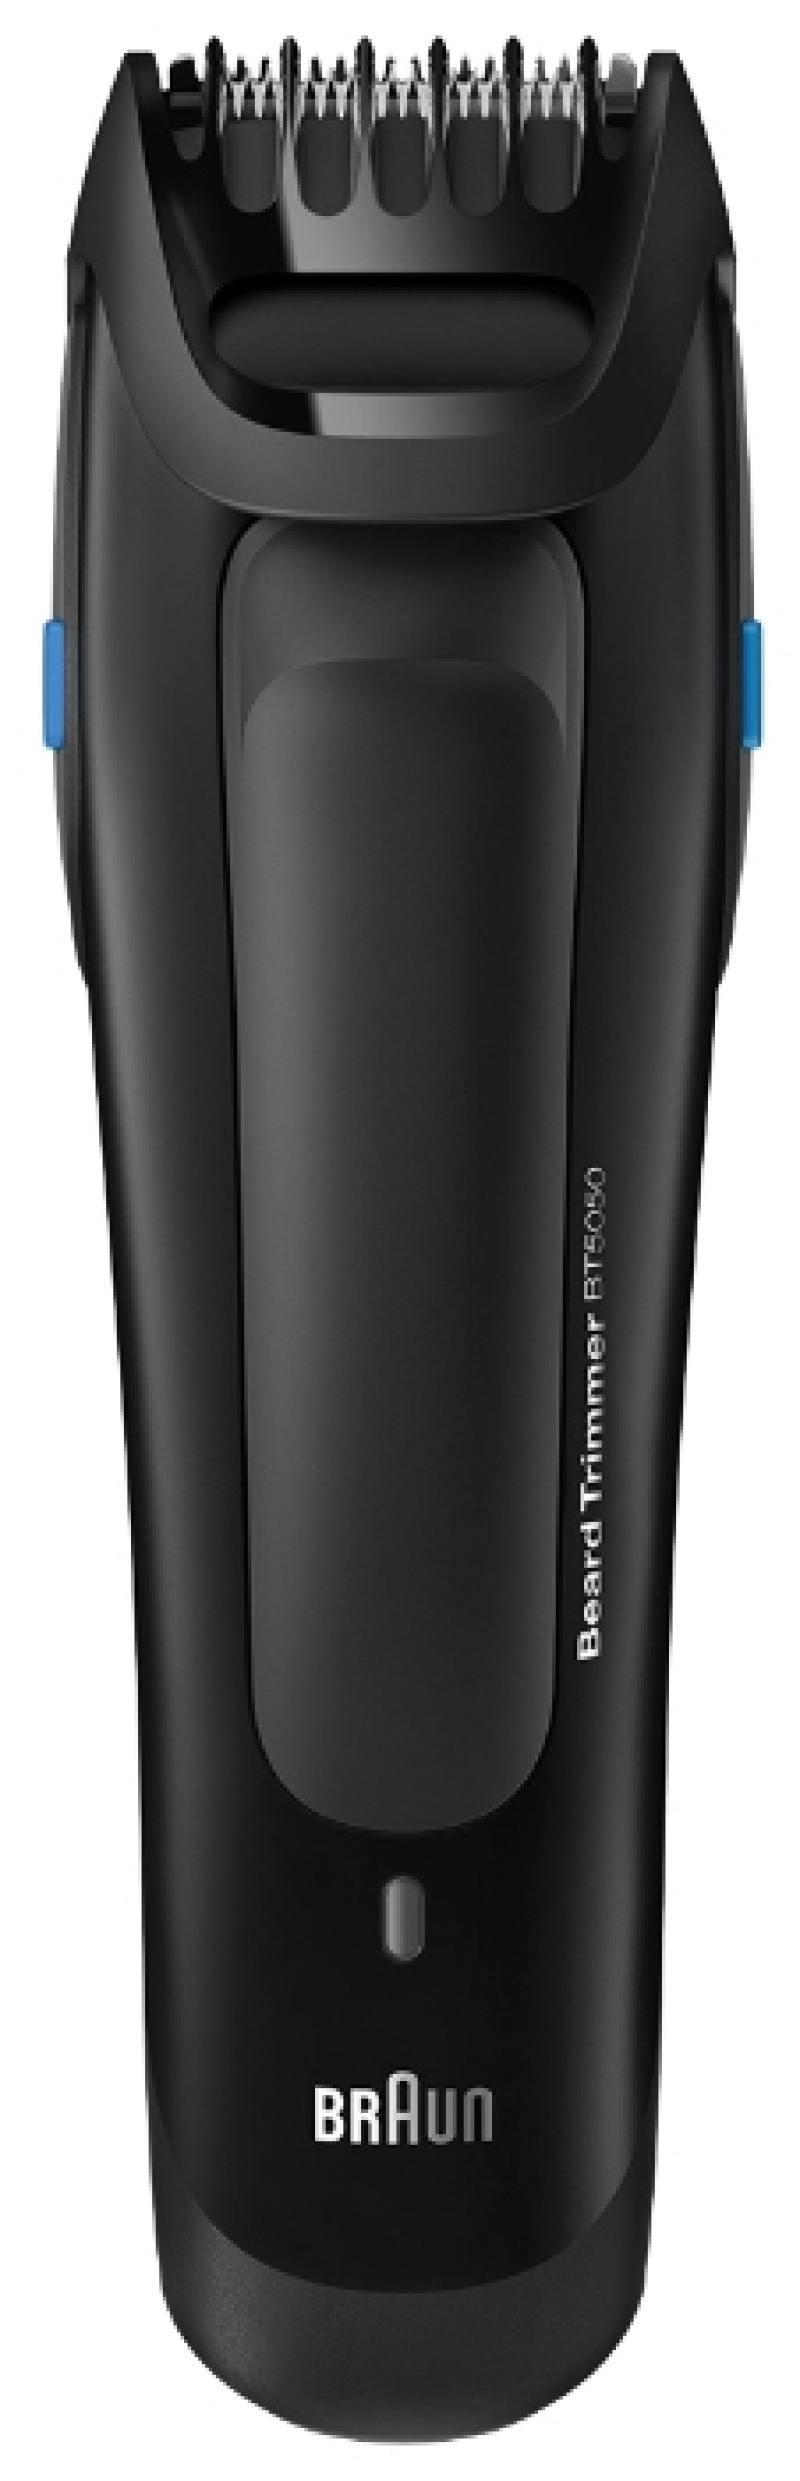 Триммер Braun BT5050 чёрный